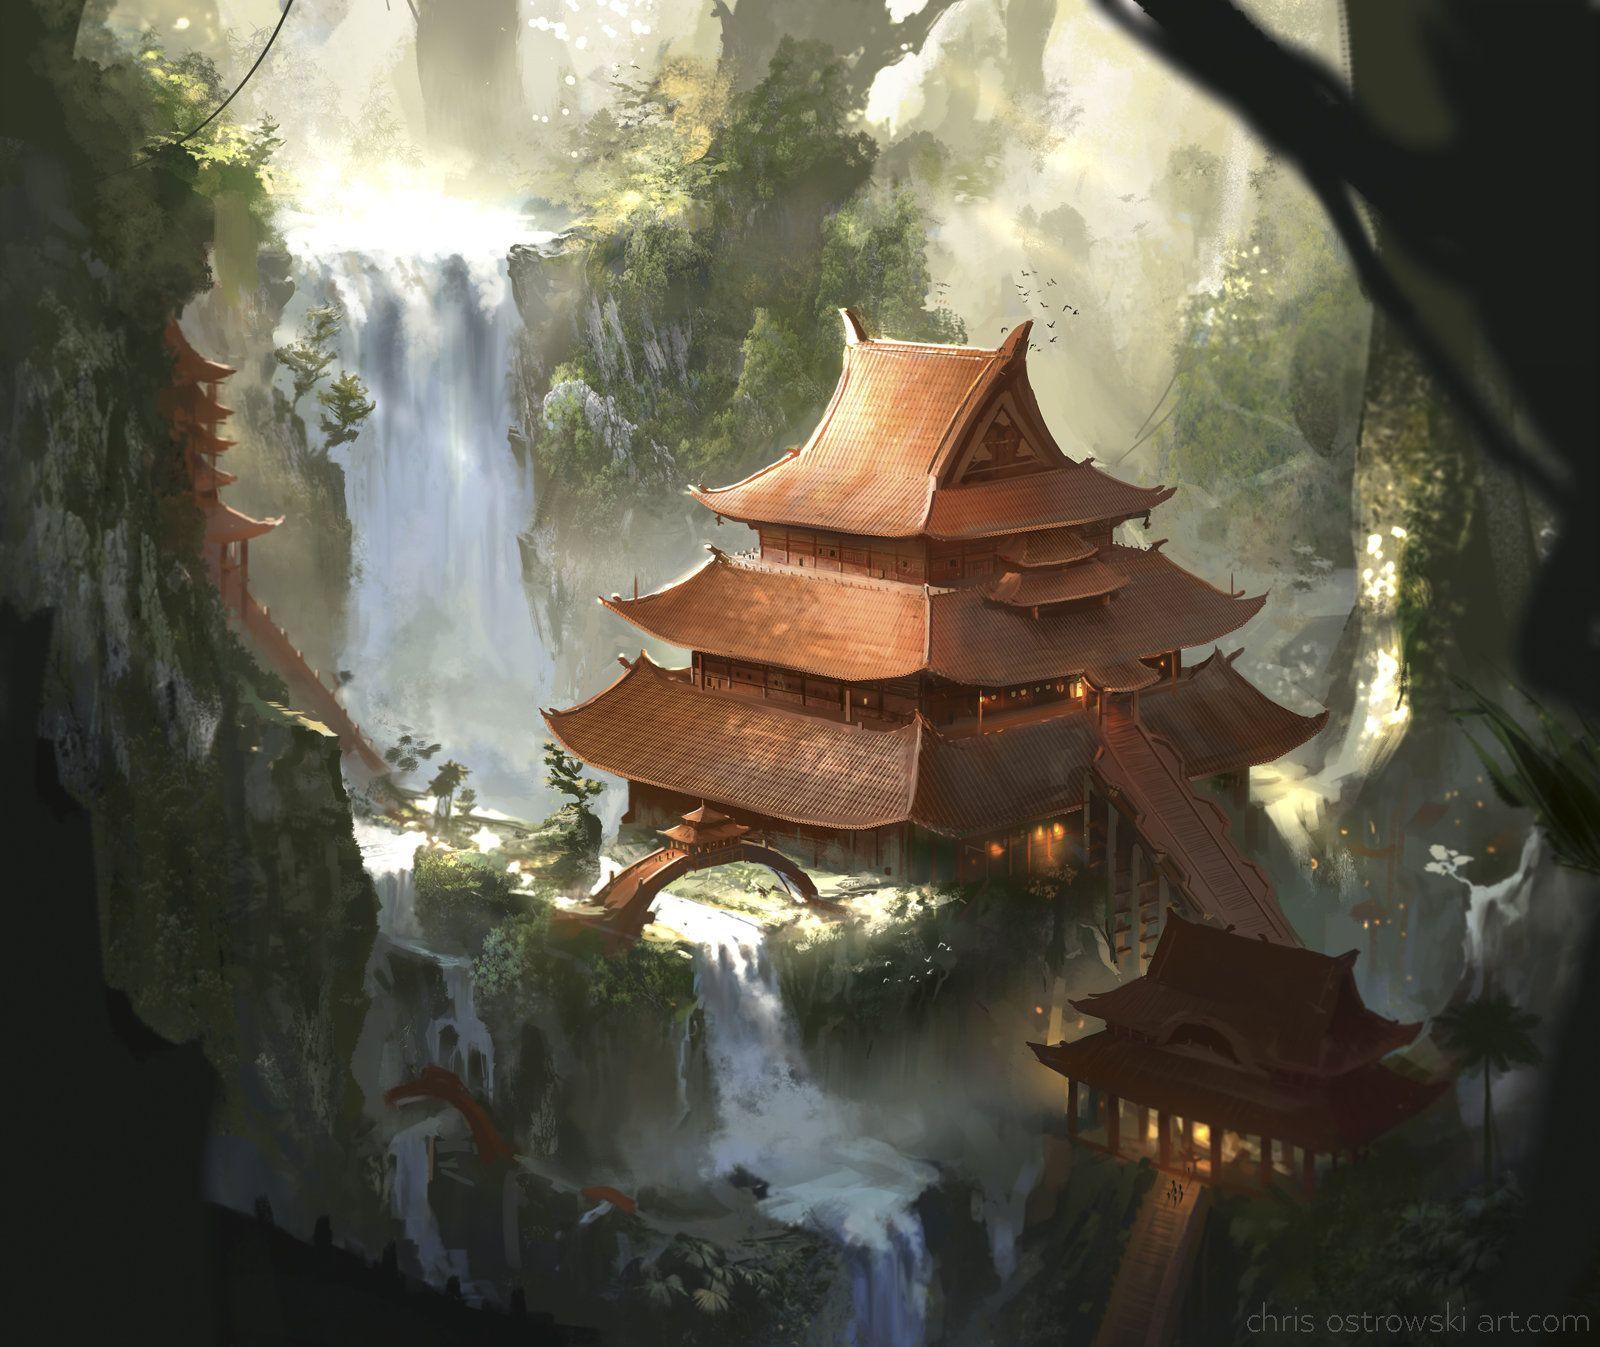 Eternal Temple, Chris Ostrowski on ArtStation at https://www.artstation.com/artwork/3doDB